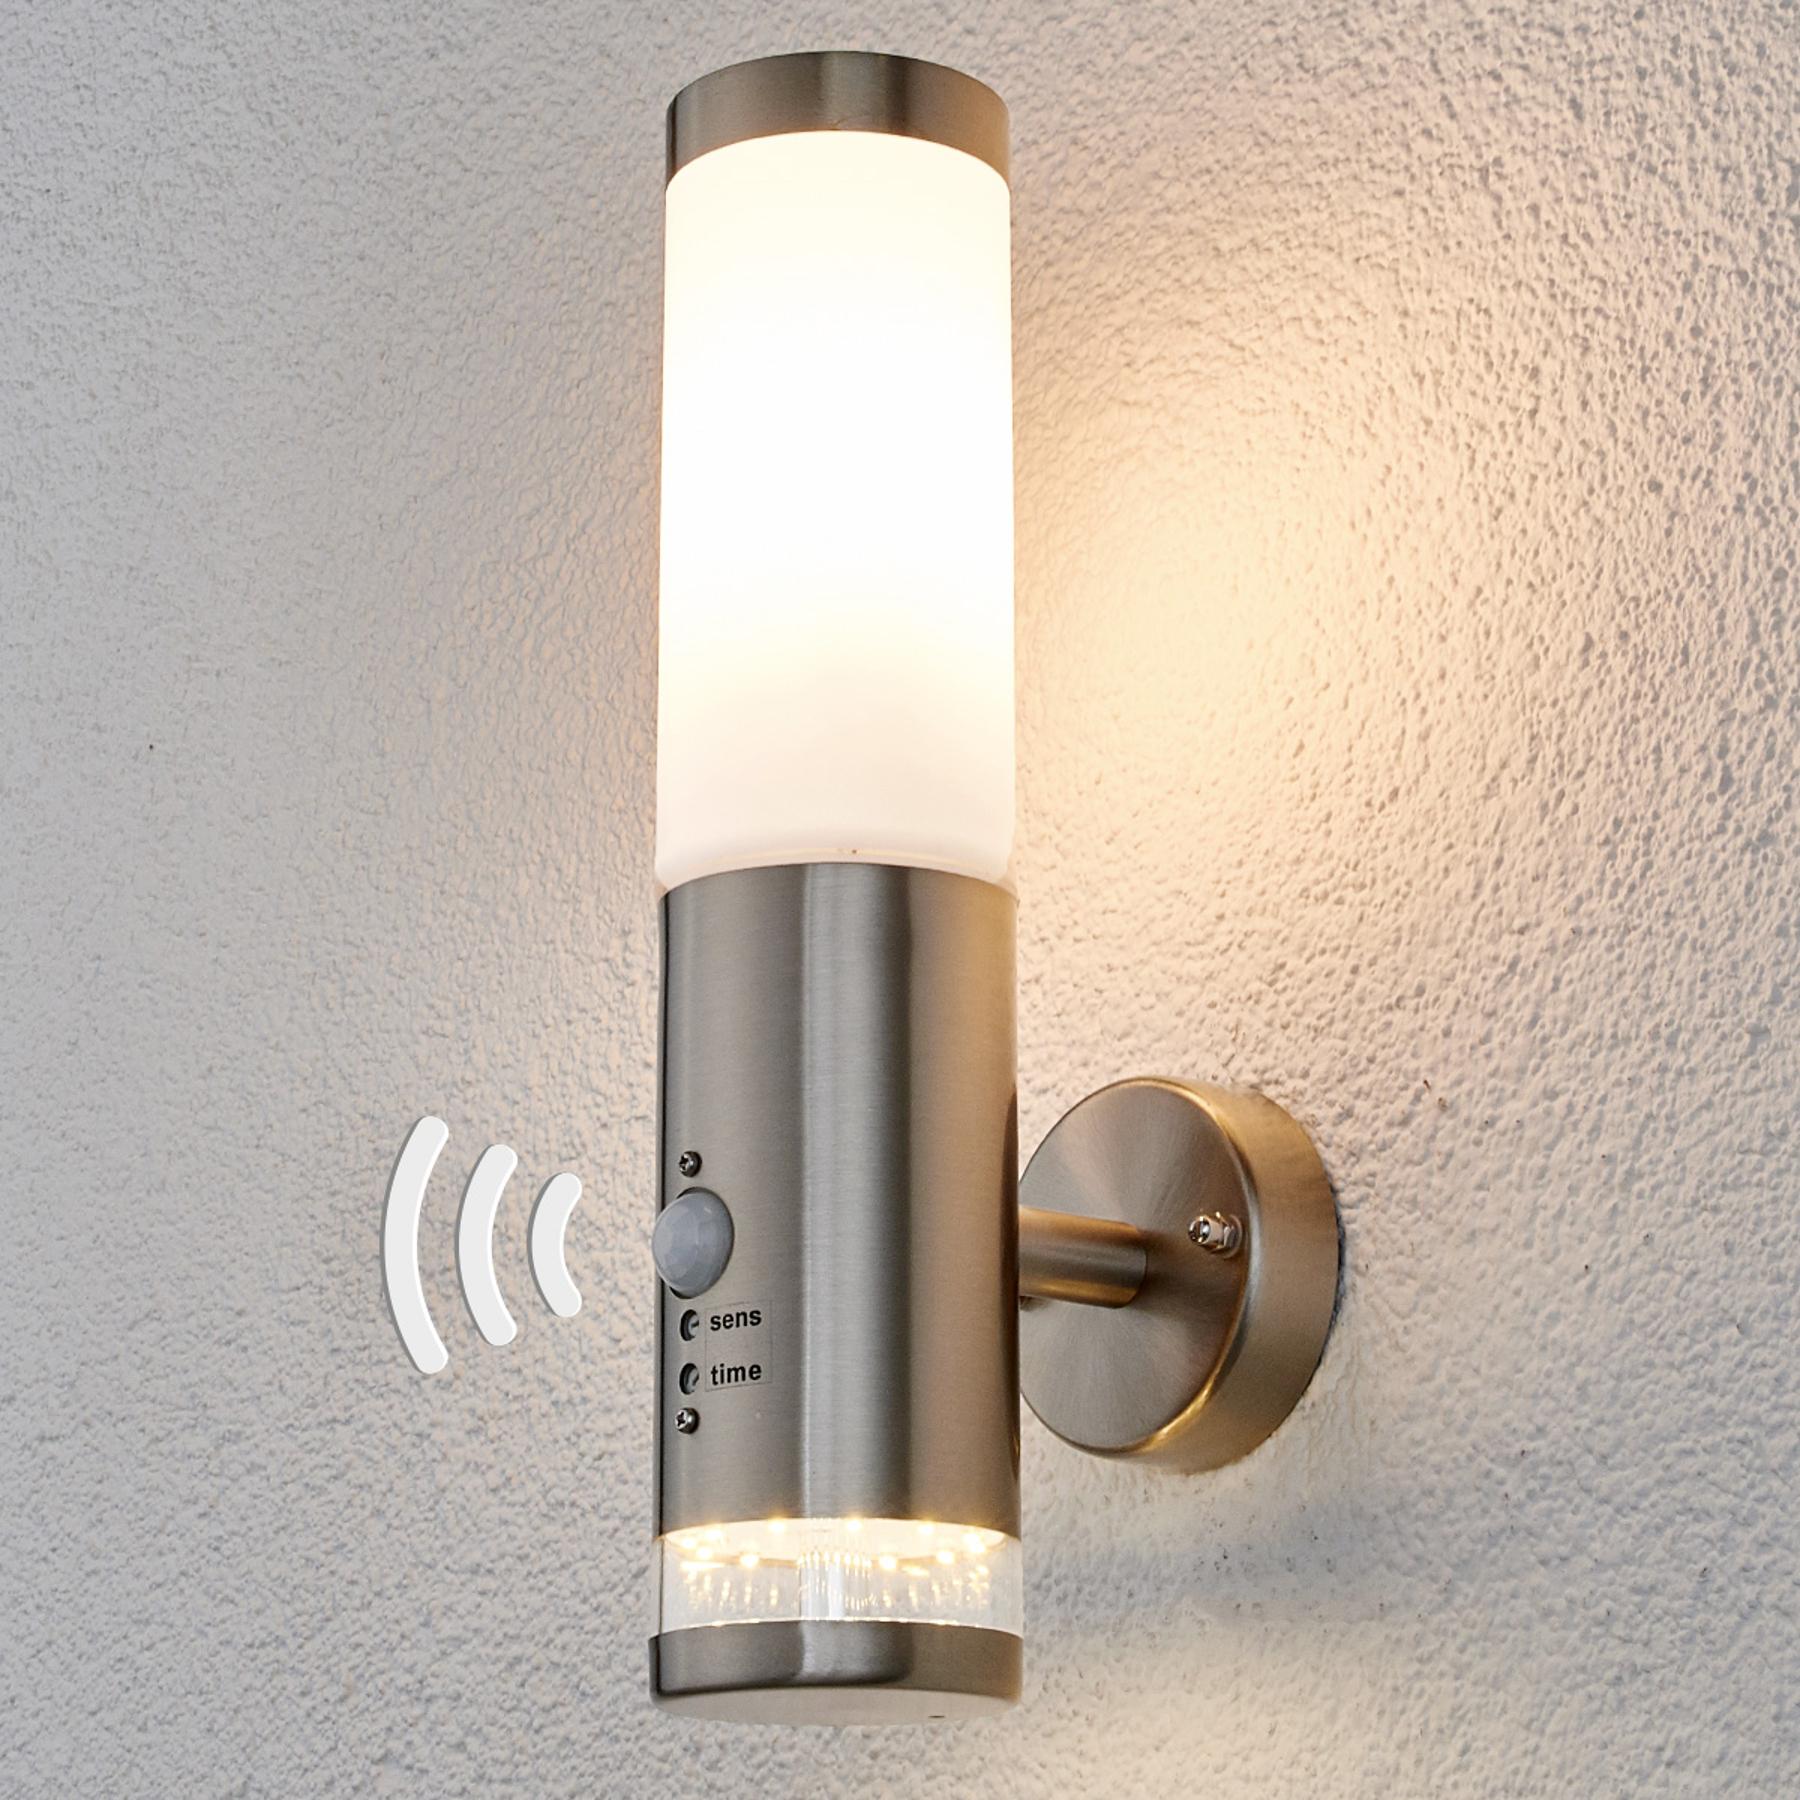 Buitenwandlamp Binka met sensor